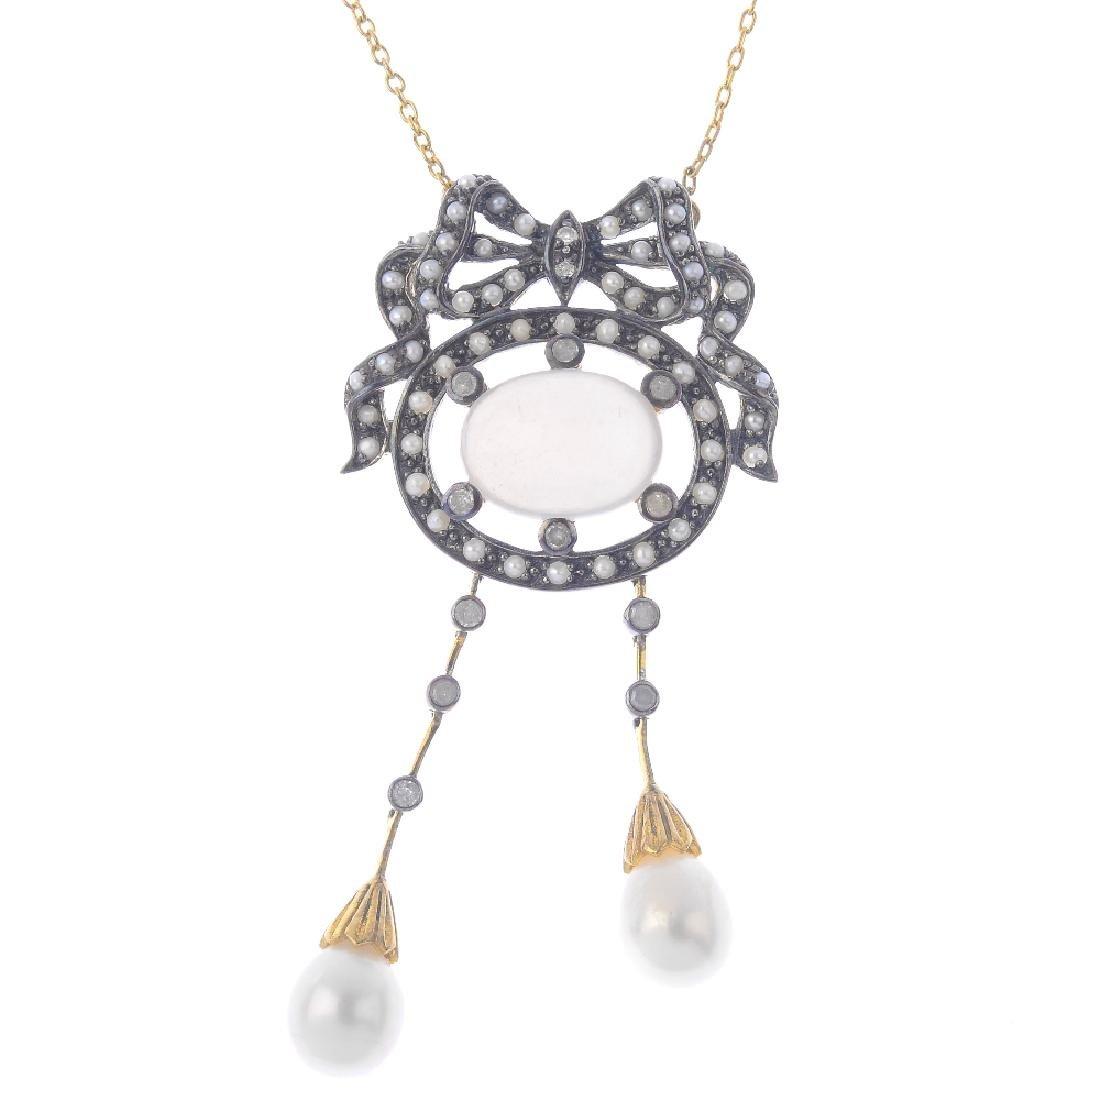 A gem-set necklace. Designed as an oval moonstone